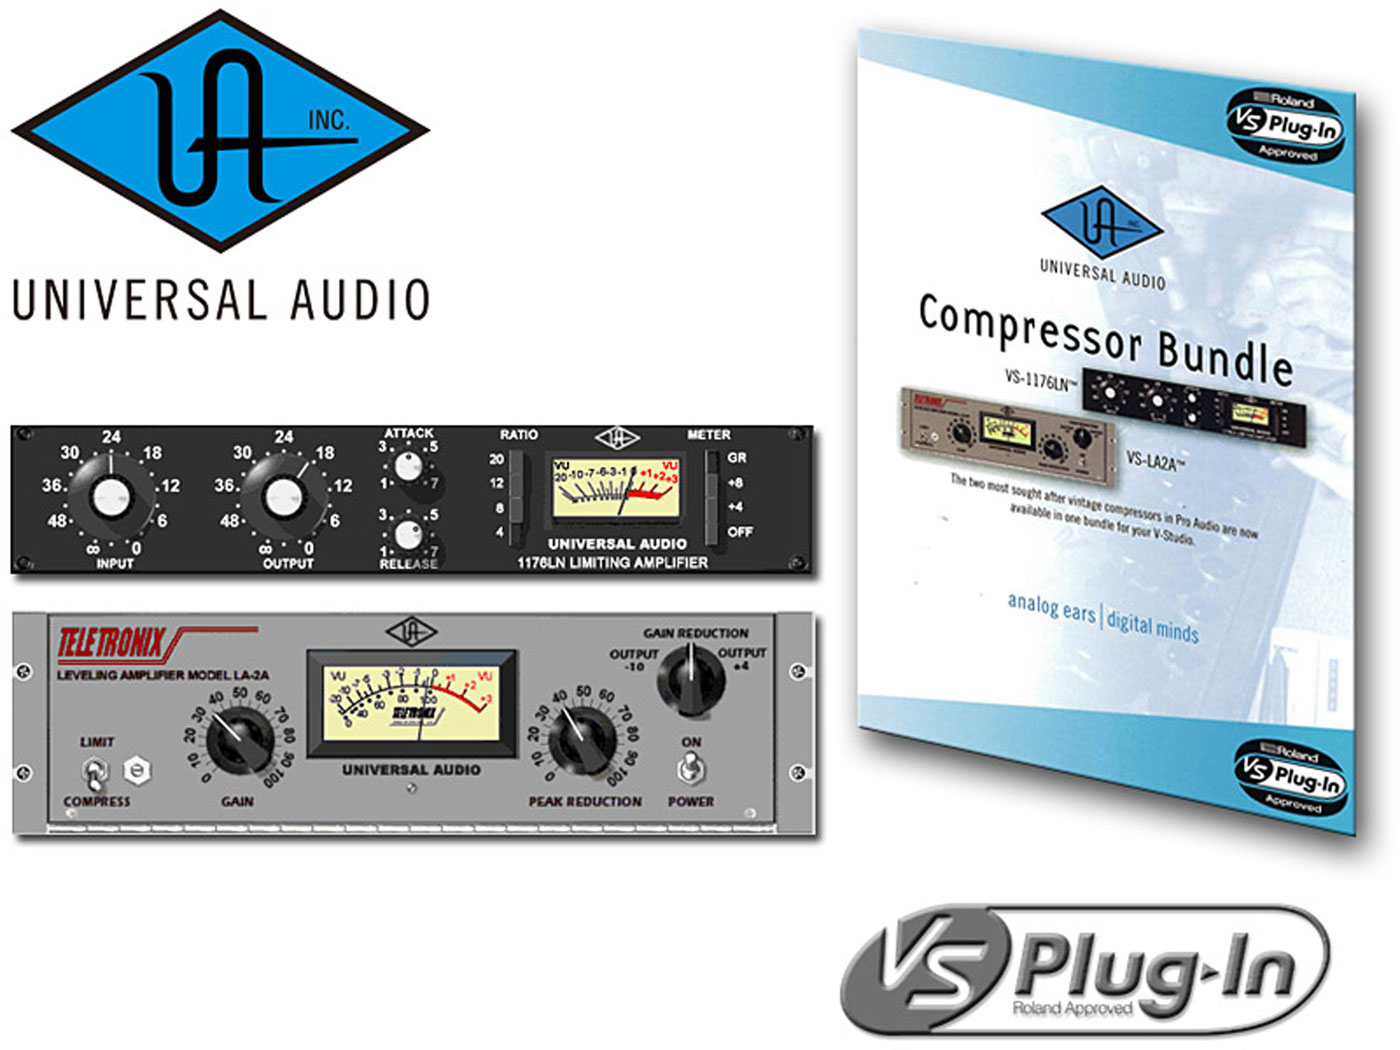 Compressor Bundle | VS Plug-In by Universal Audio - Roland